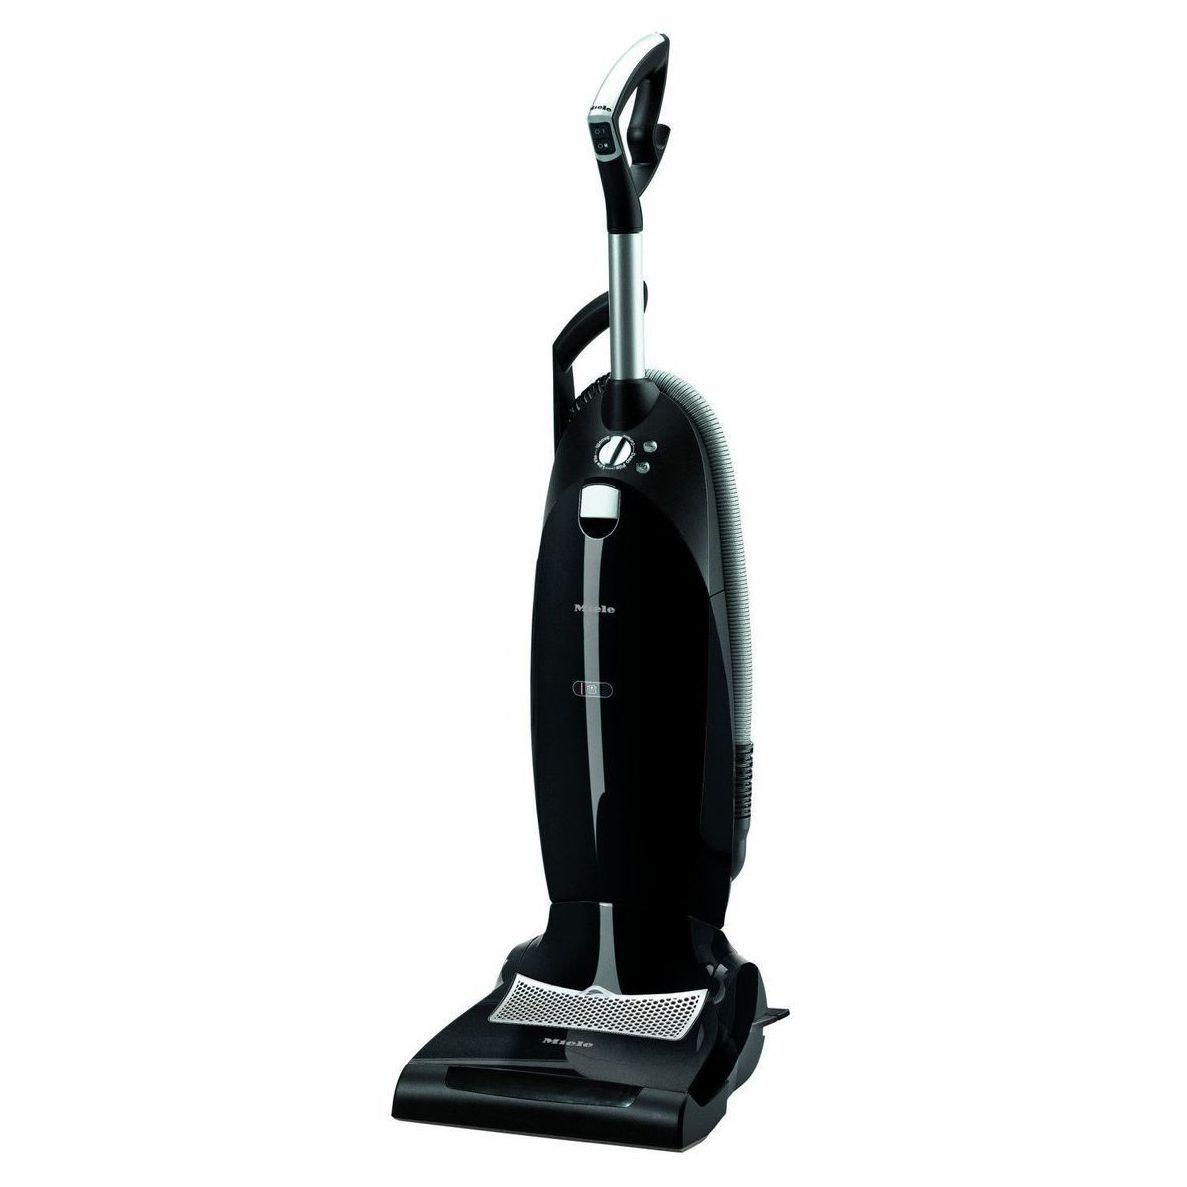 7 Best Vacuum Cleaner Reviews 2018 Top Rated Vacuum Models